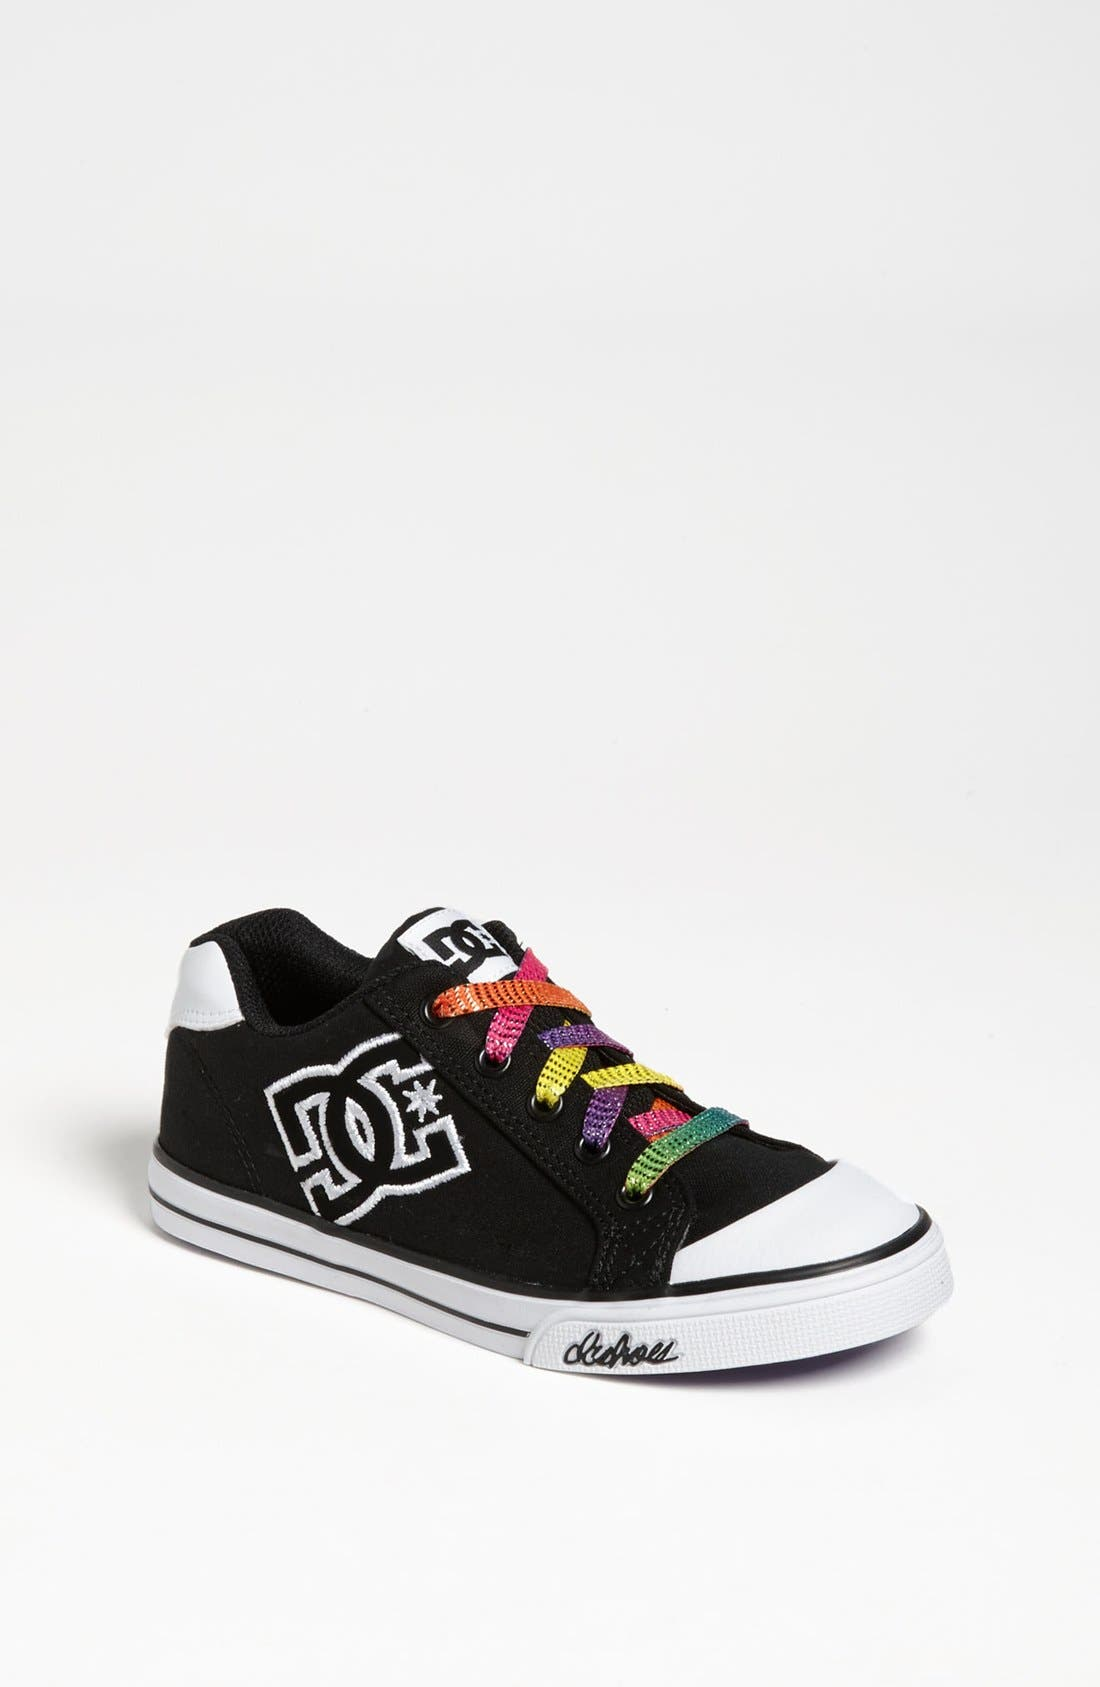 Main Image - DC Shoes 'Chelsea' Sneaker (Toddler, Little Kid & Big Kid)